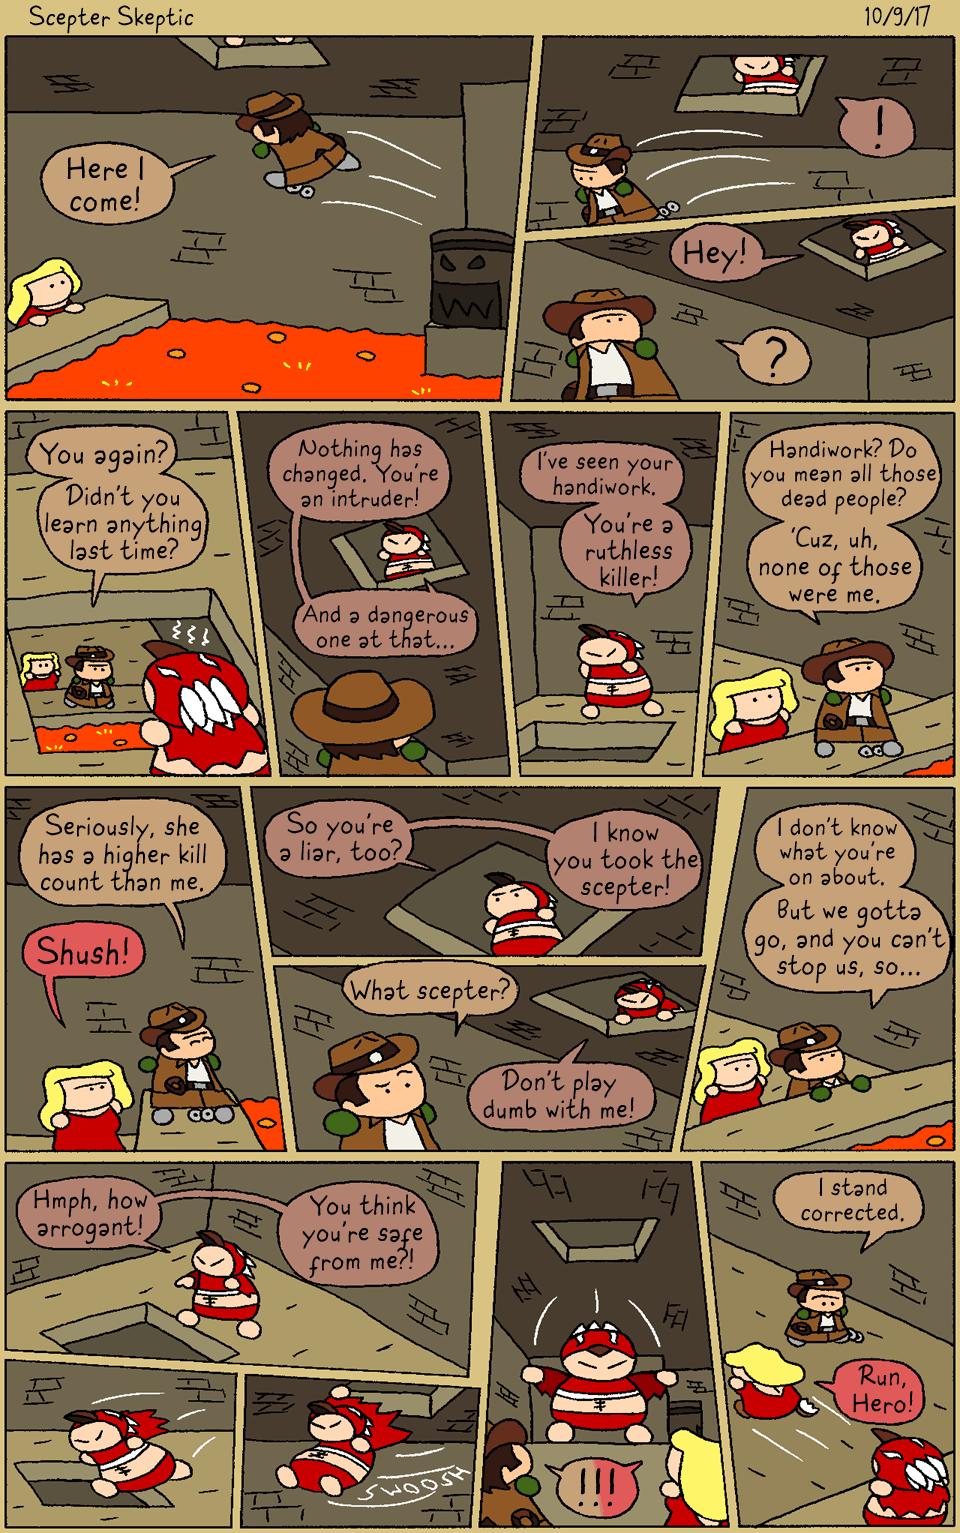 Scepter Skeptic